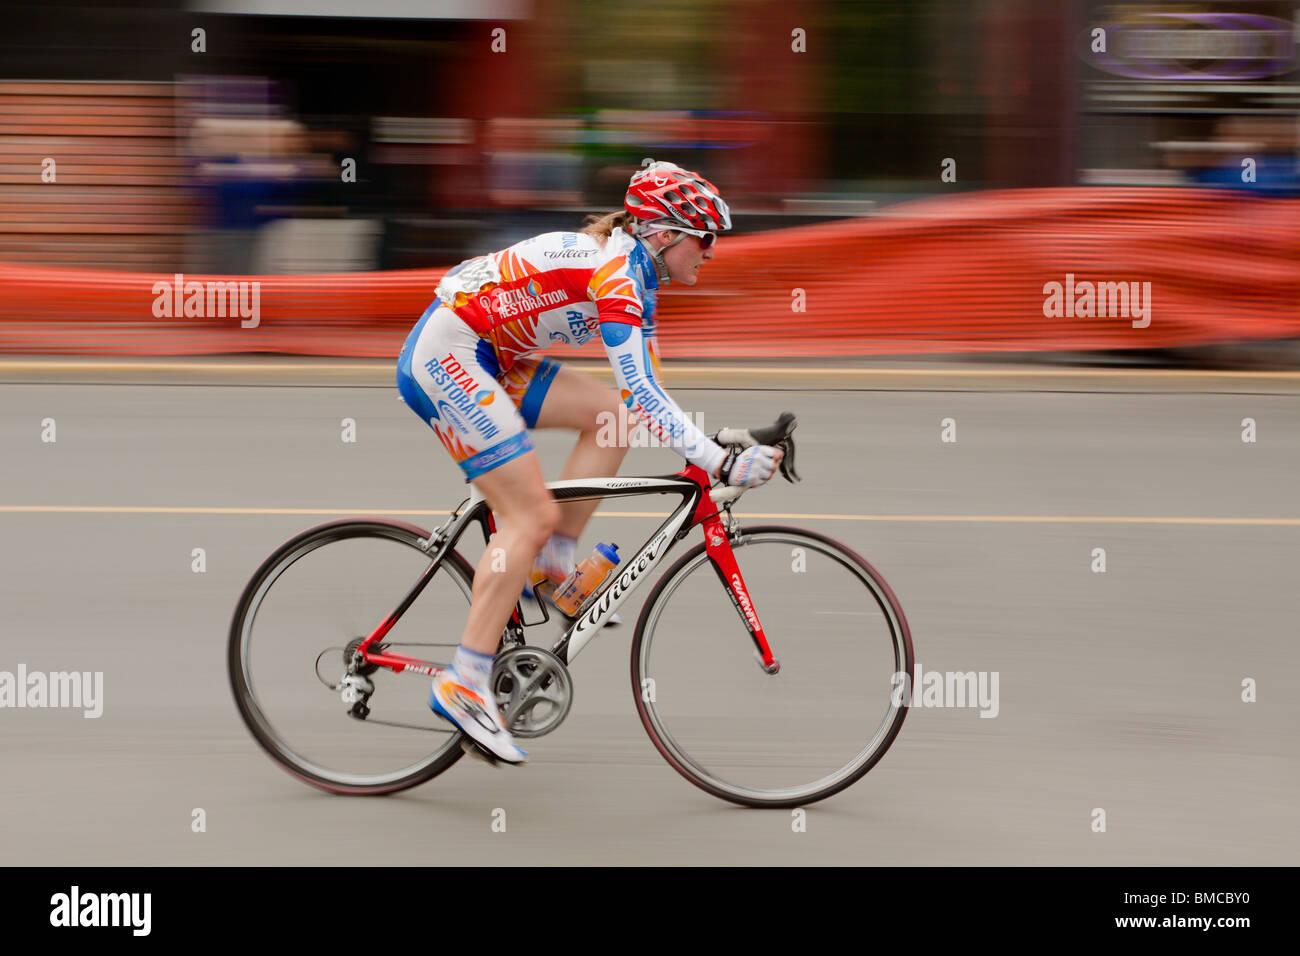 Ladies 2010 Bastion Square Gran Prix bicycle race-Victoria, British Columbia, Canada. - Stock Image